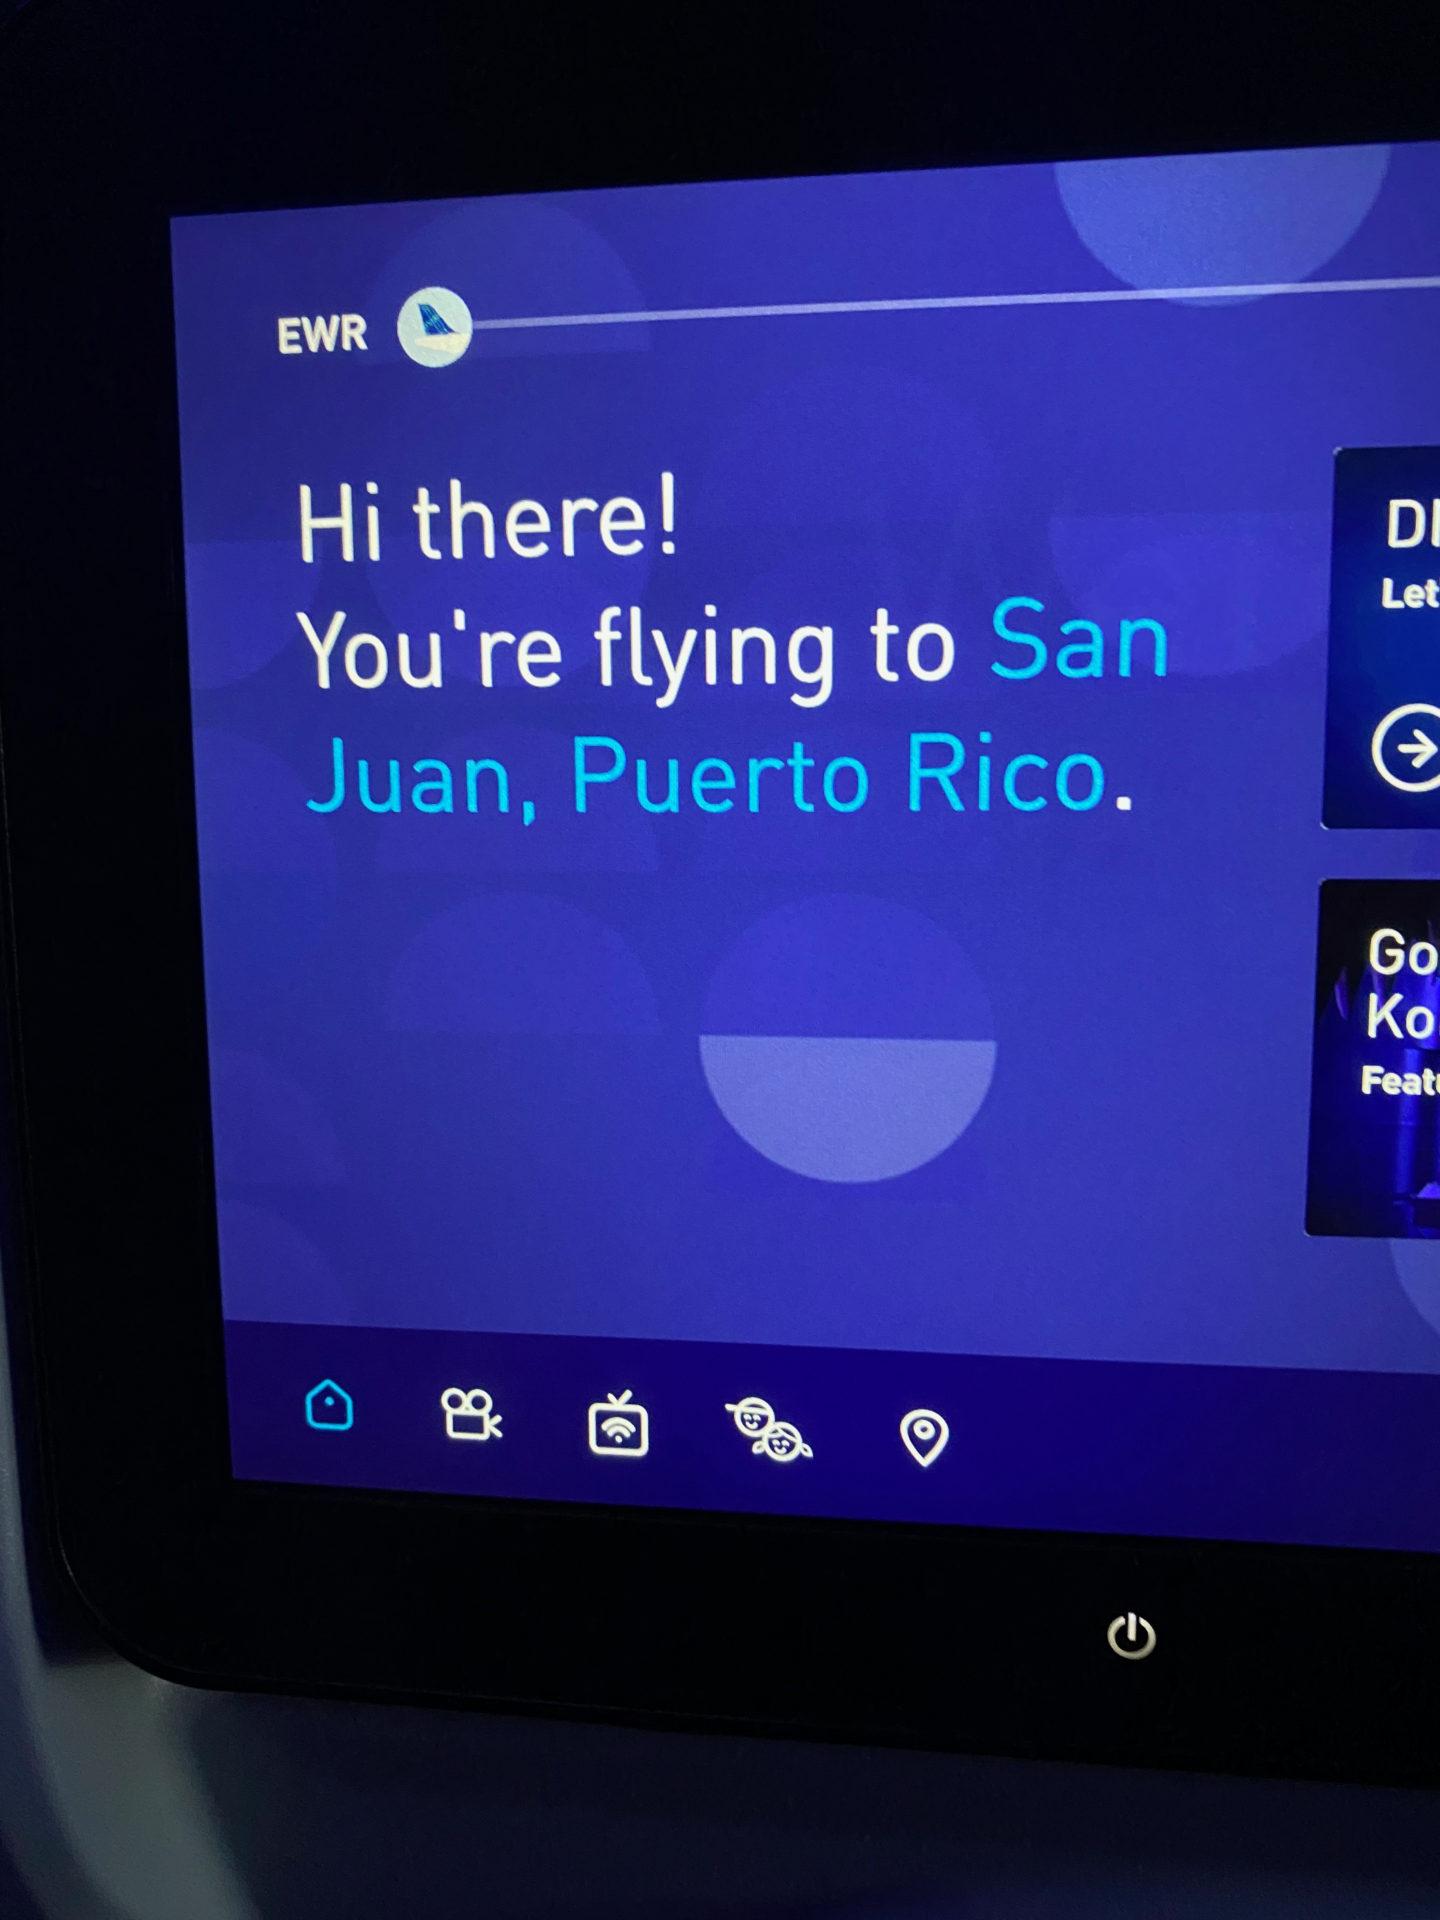 Our Trip To San Juan, Puerto Rico